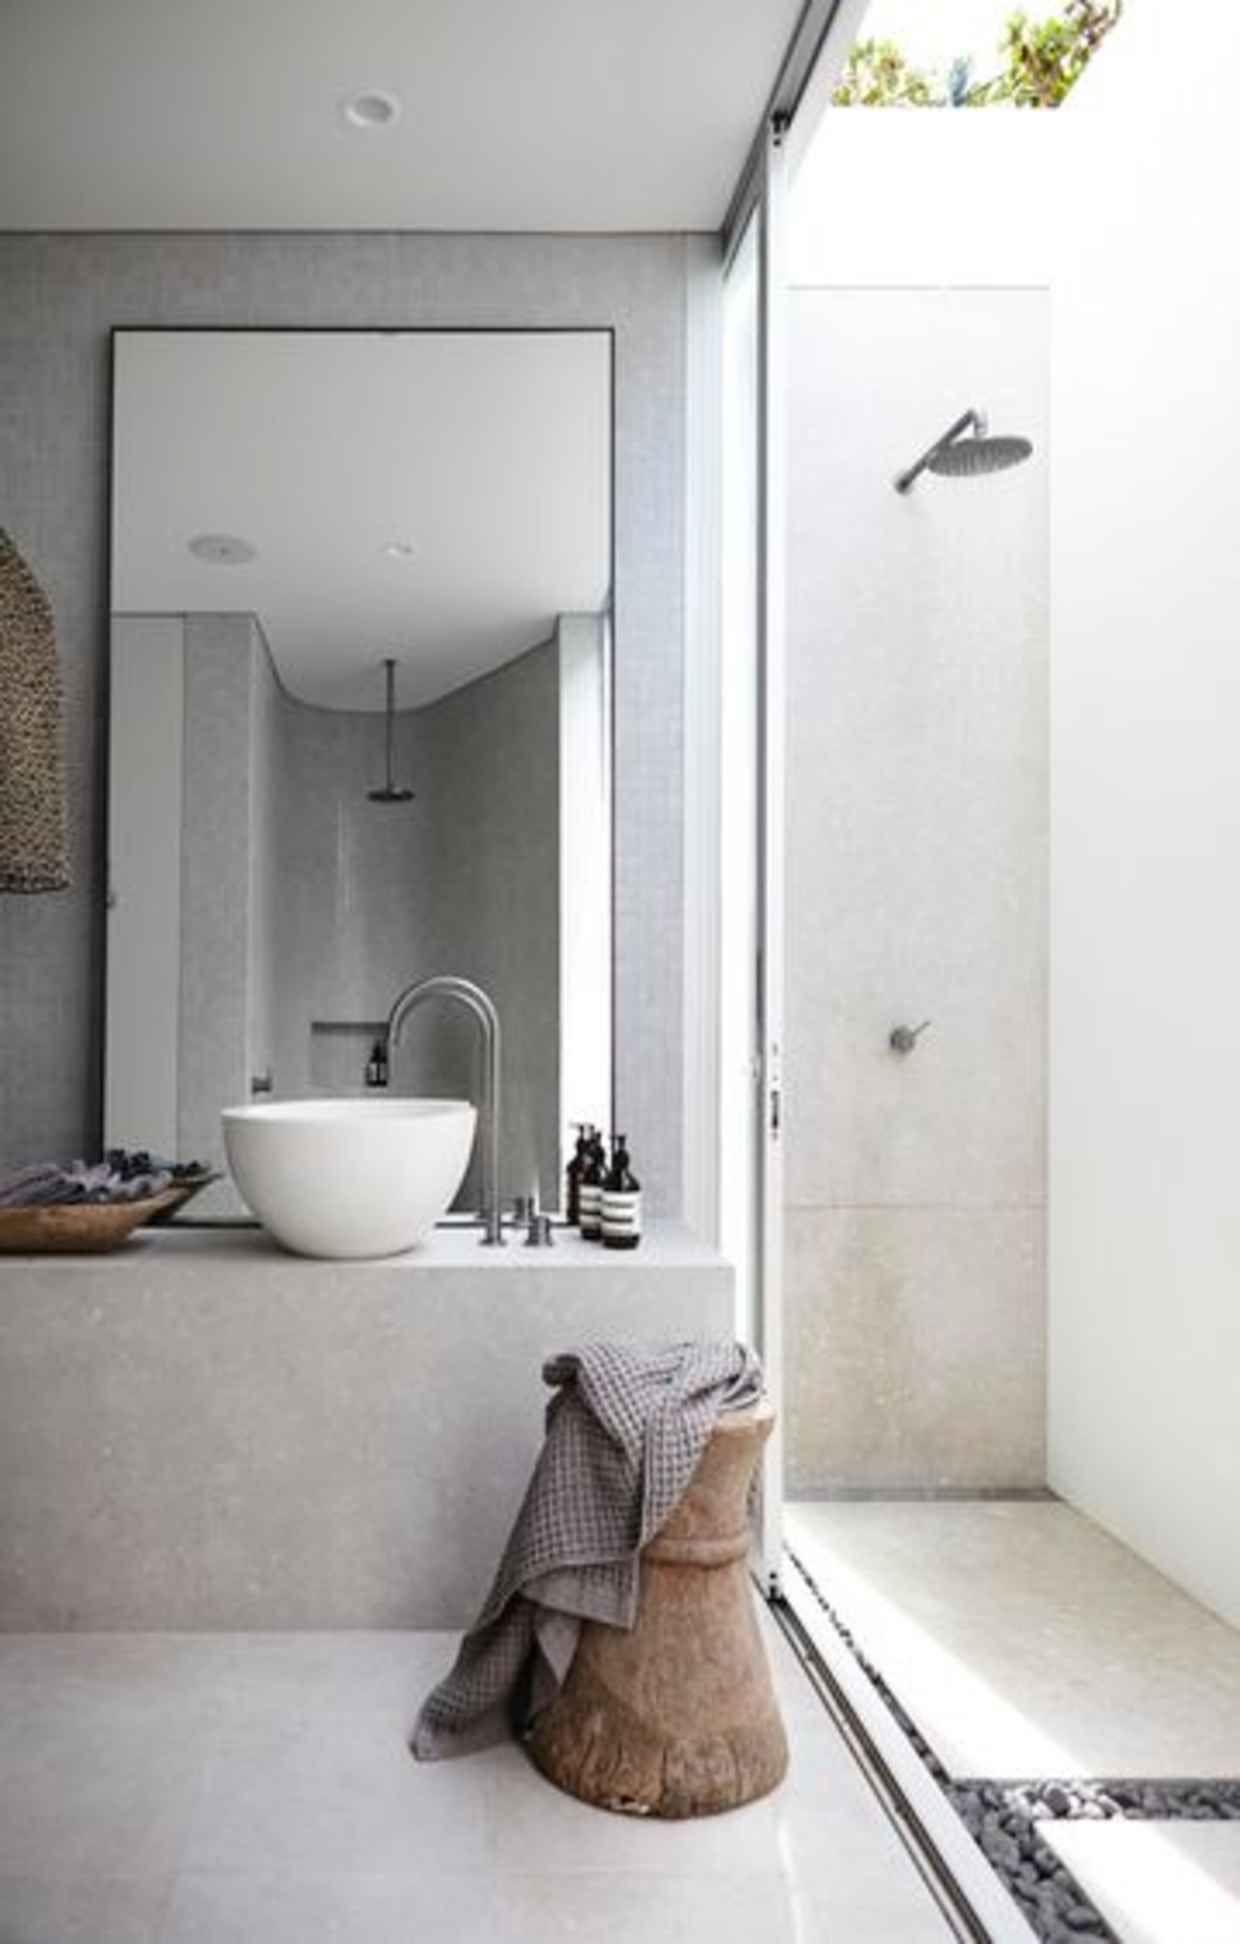 30 Examples Of Minimal Interior Design #11 | Minimal, 30th and Interiors